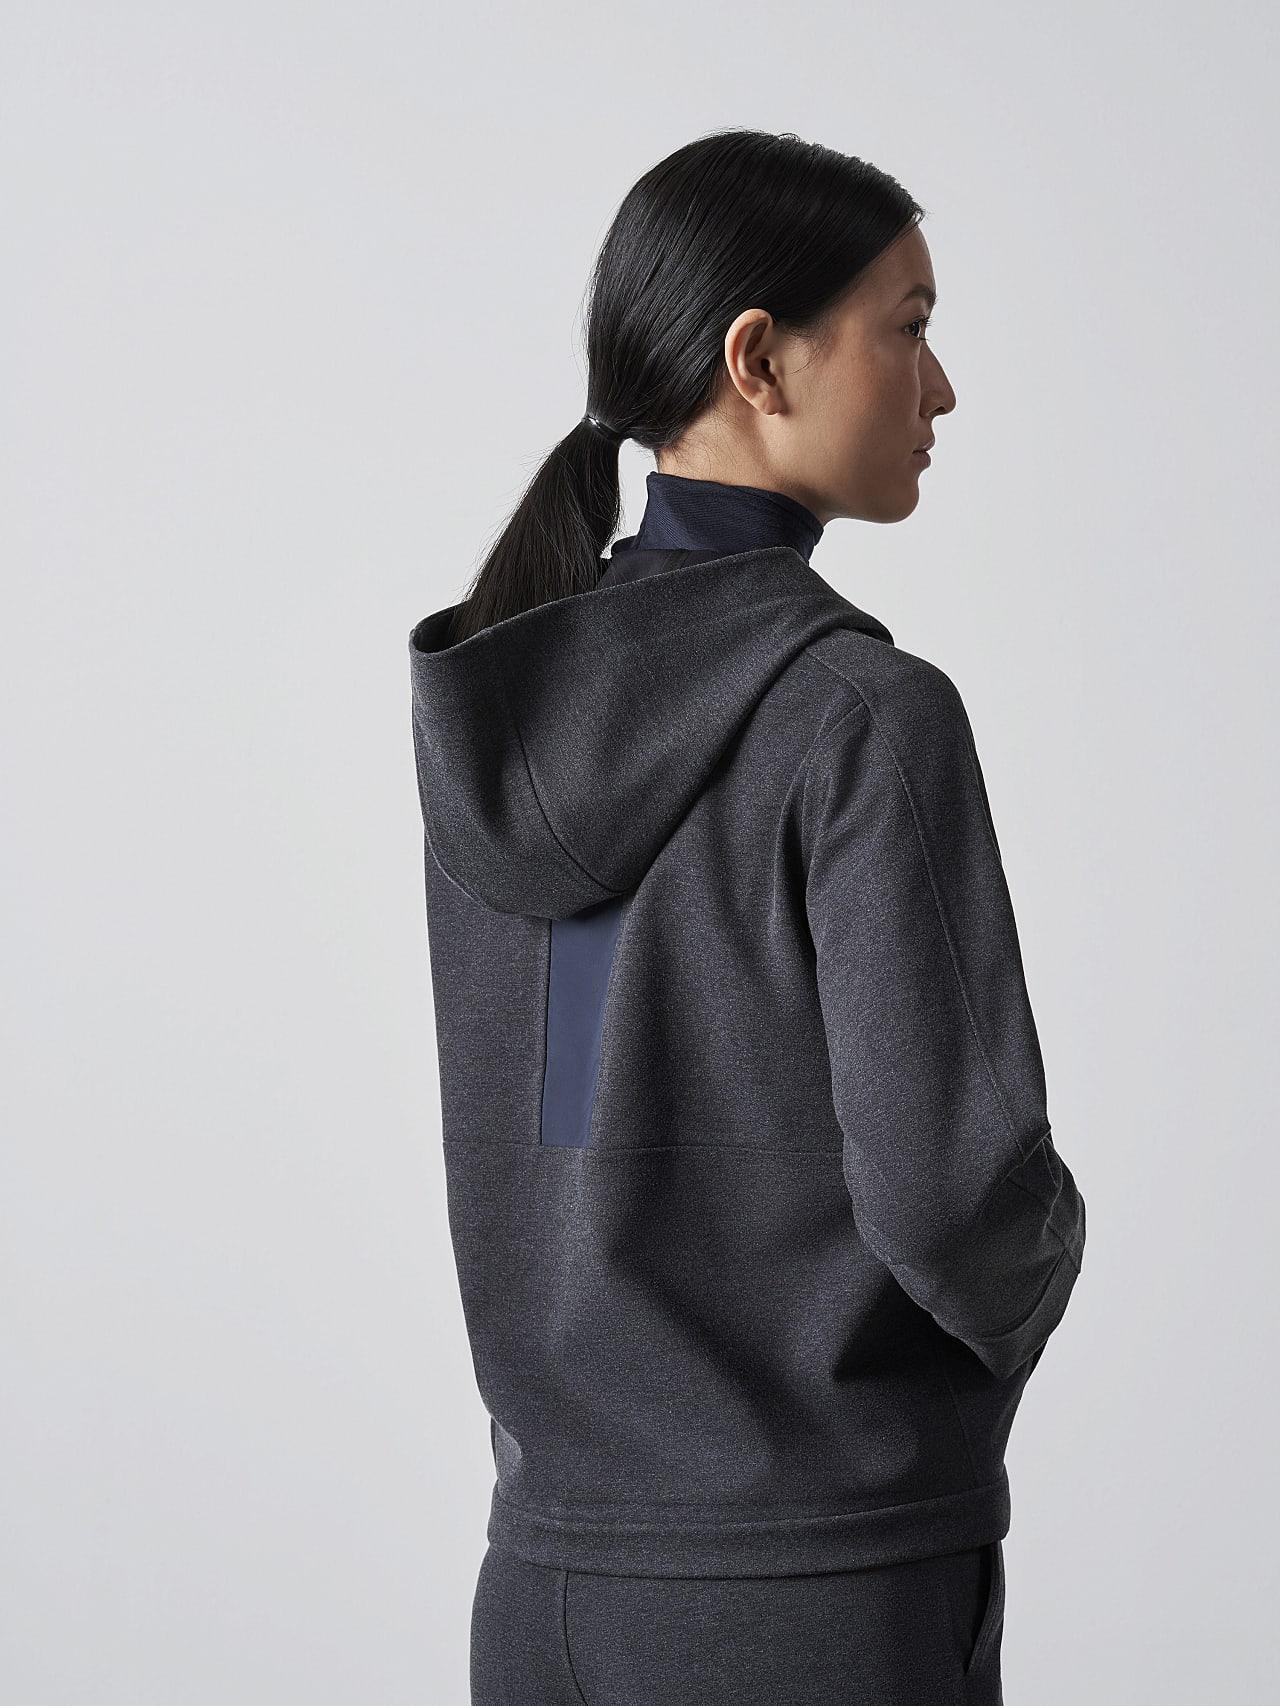 SINNO V2.Y5.02 Waterproof Hooded Jacket dark grey / anthracite Front Main Alpha Tauri